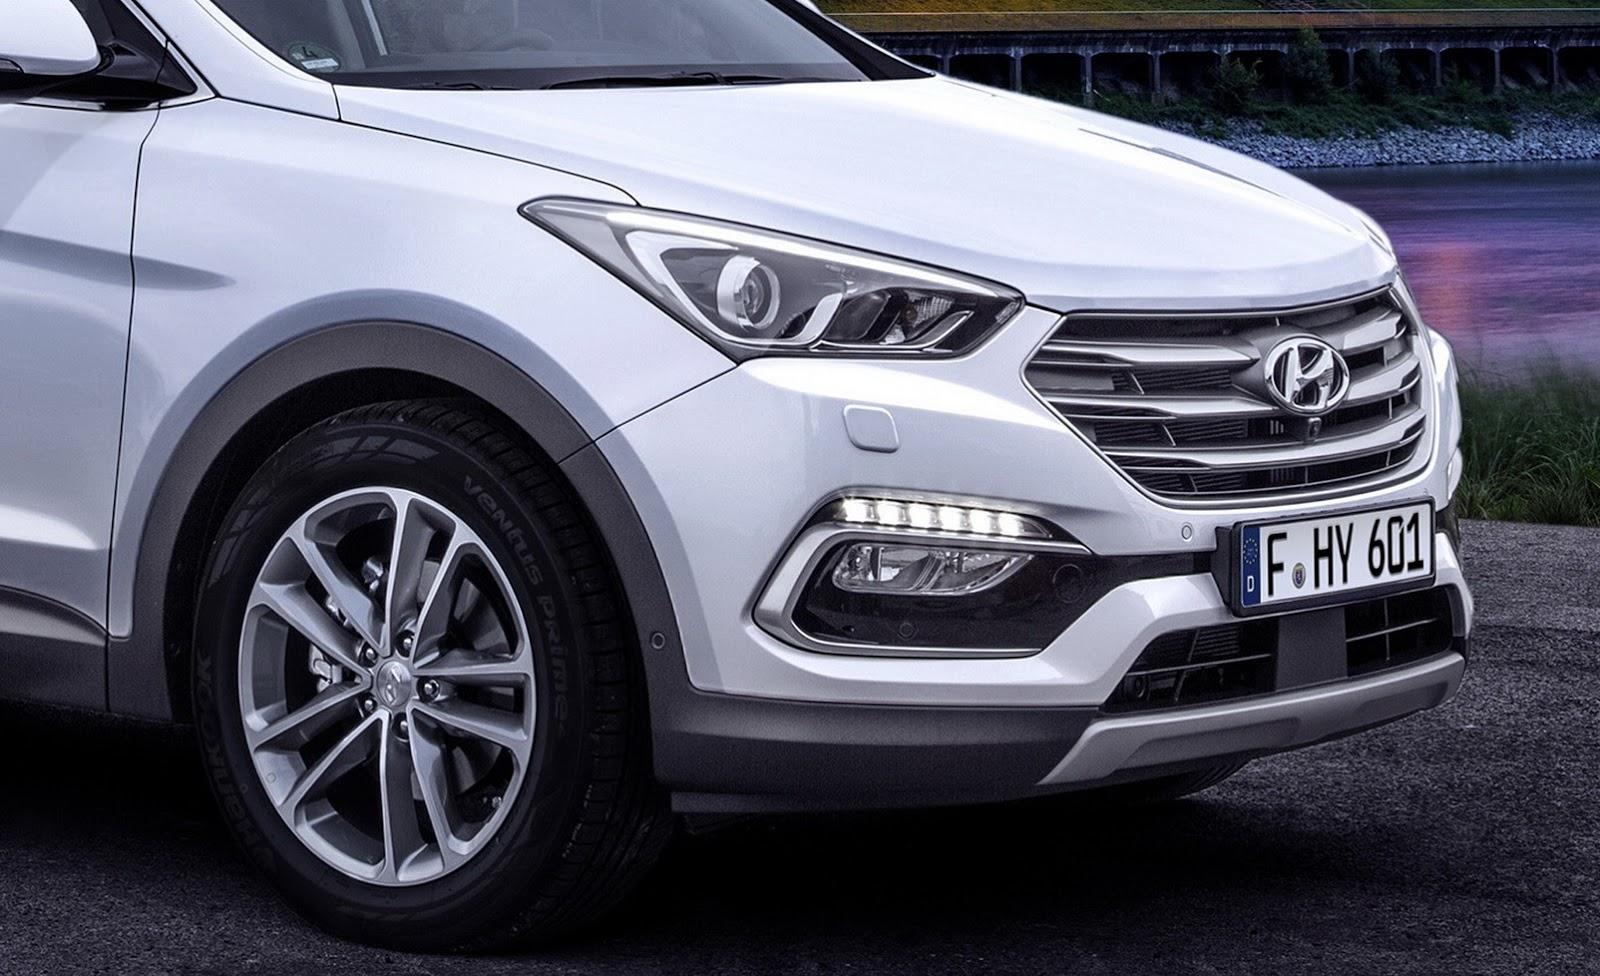 Facelifted 2017 Hyundai Santa Fe Unveiled Debuts In